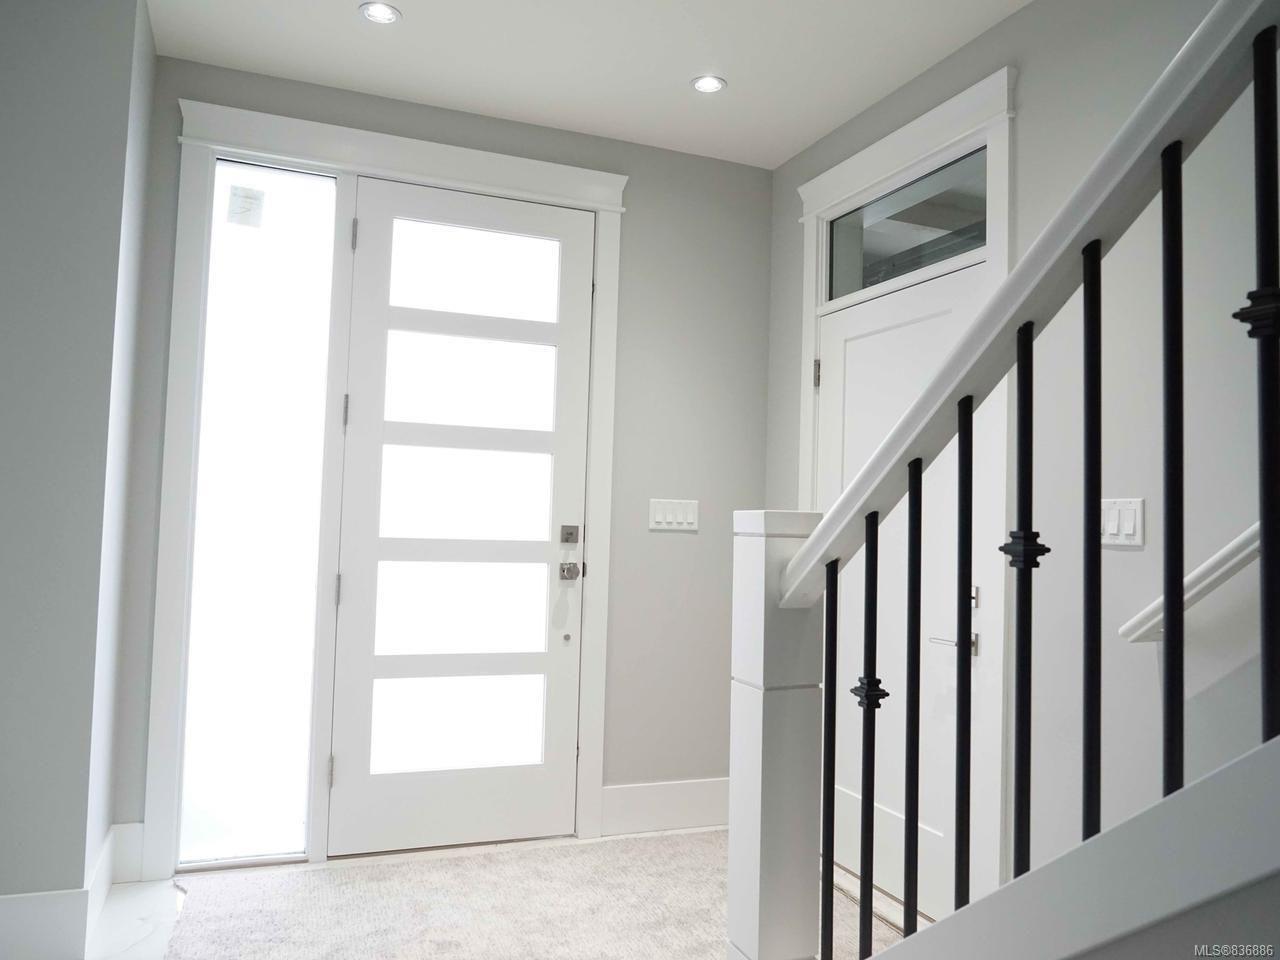 Photo 28: Photos: 123 Lindquist Rd in NANAIMO: Na North Nanaimo House for sale (Nanaimo)  : MLS®# 836886